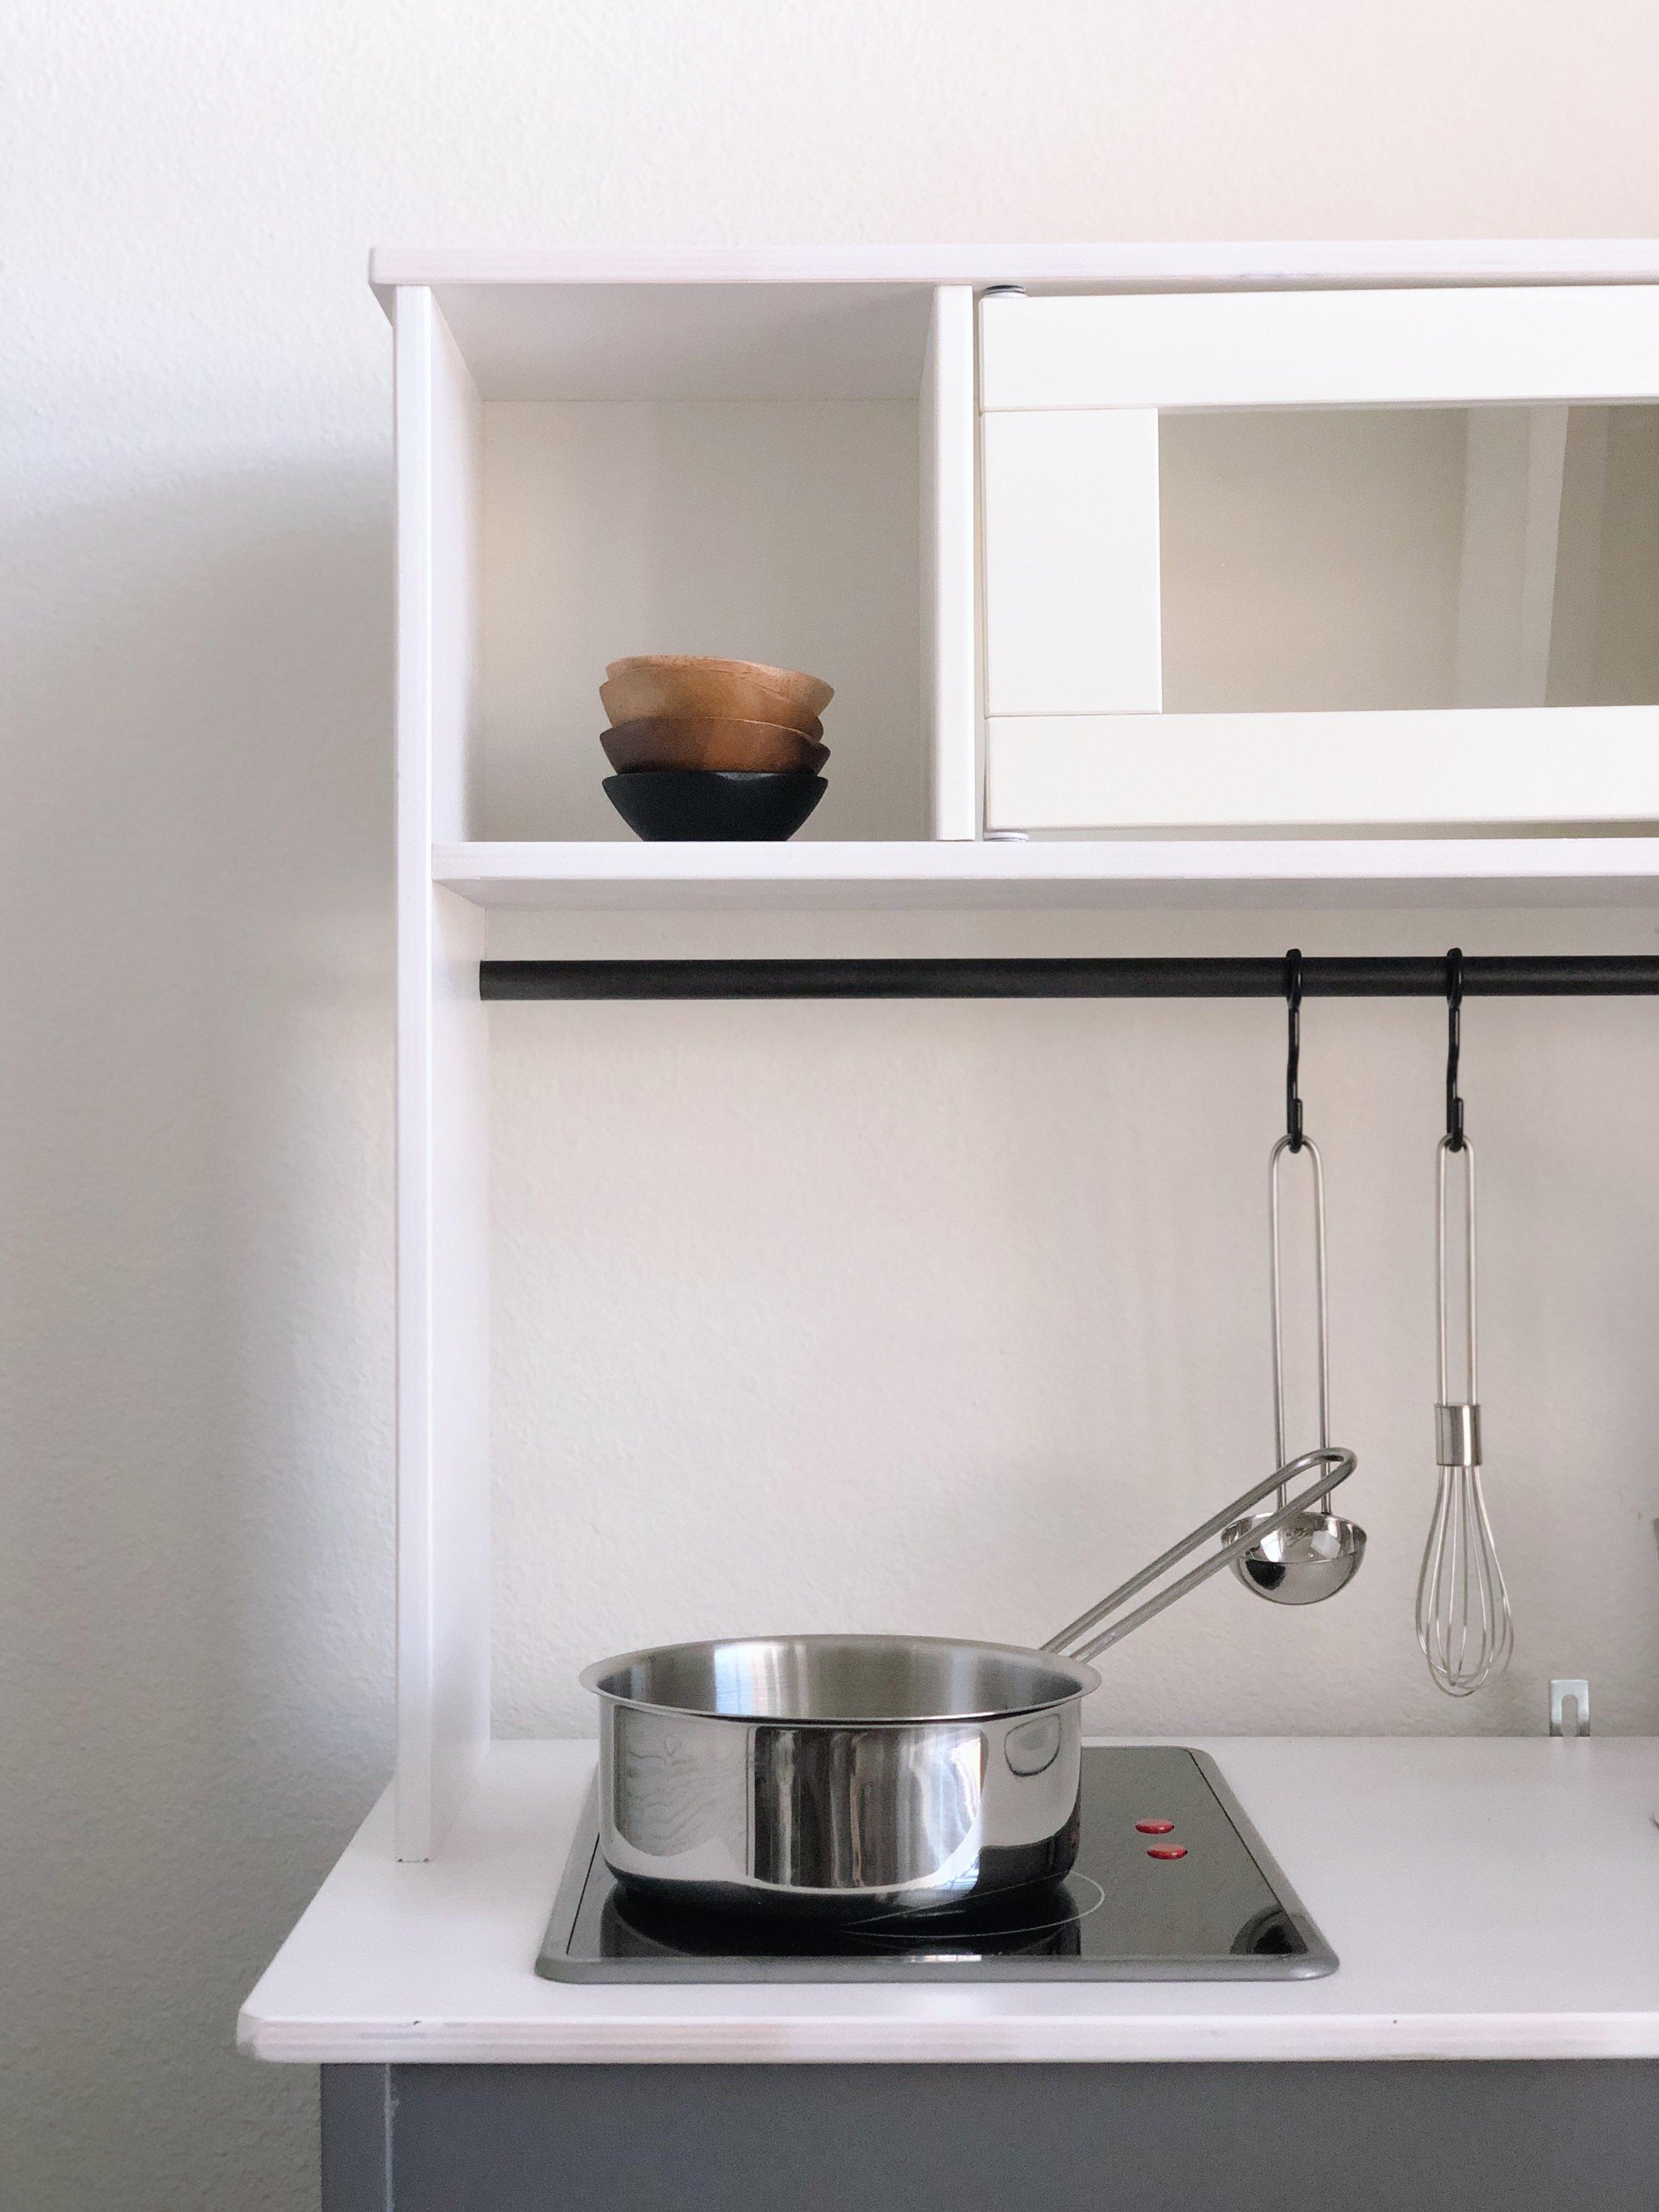 Ikea Play Kitchen Remodel | Victoria Austin